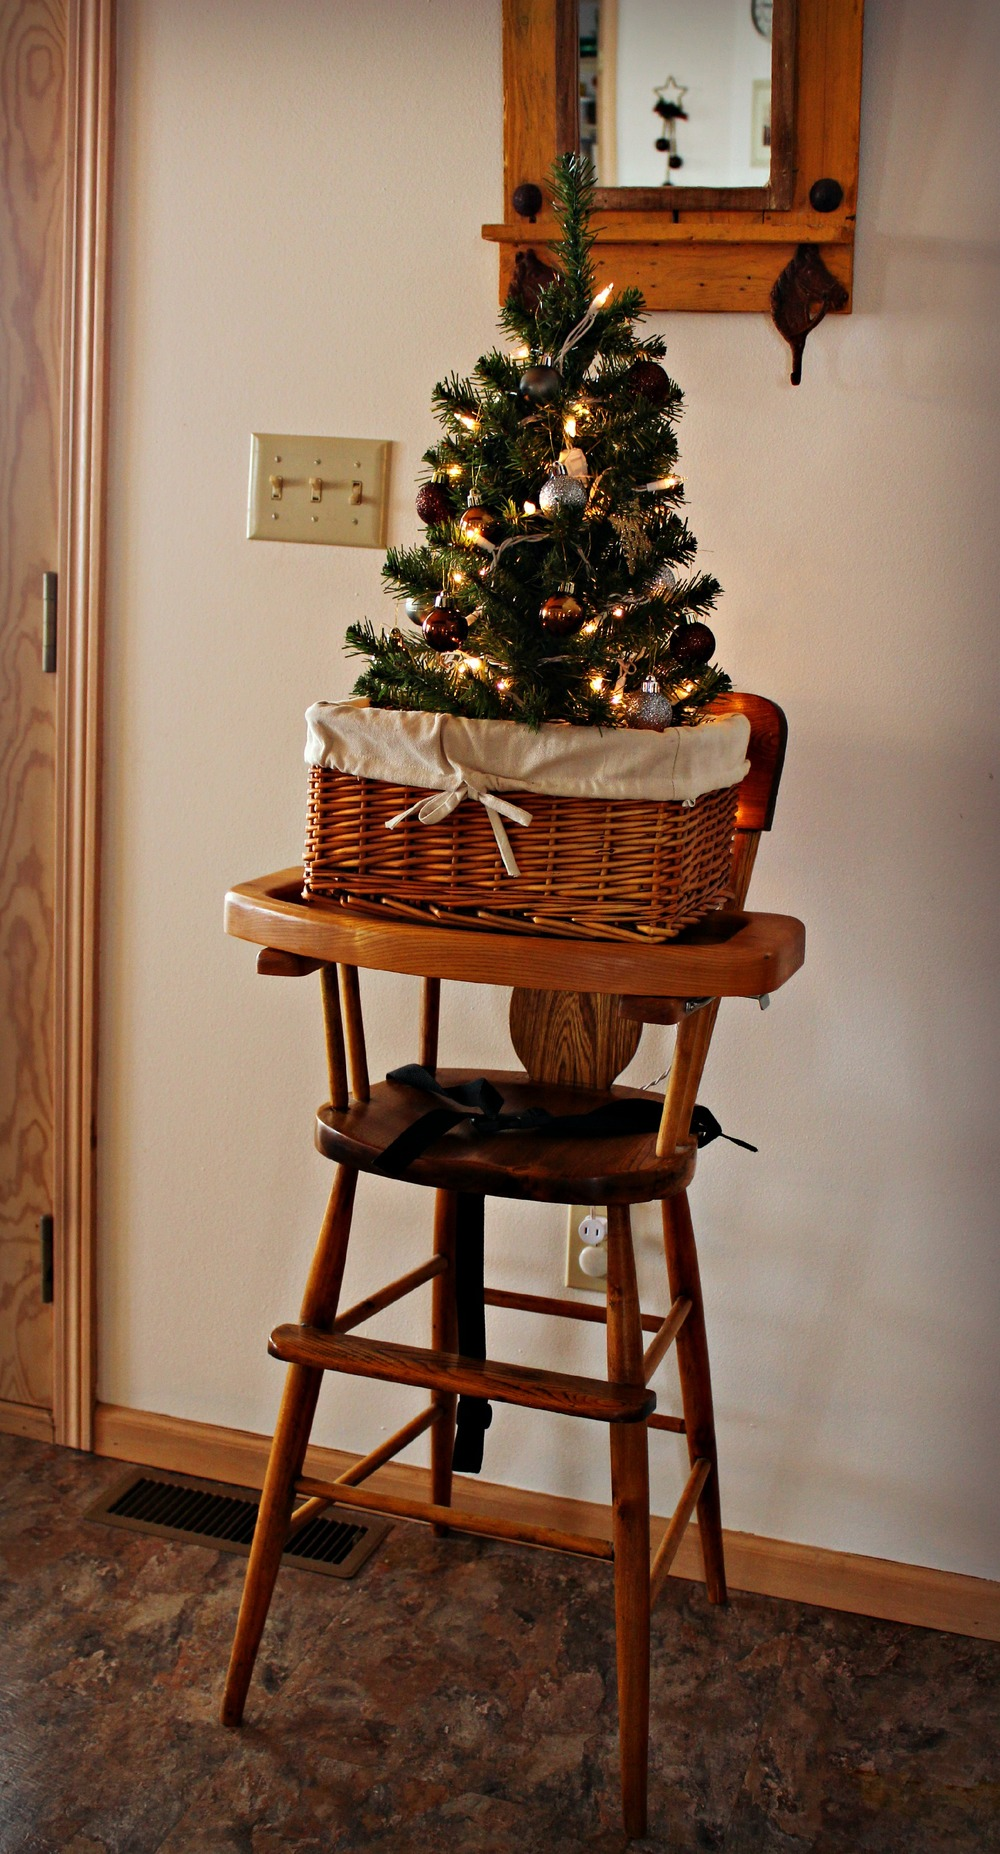 I love little trees in baskets!